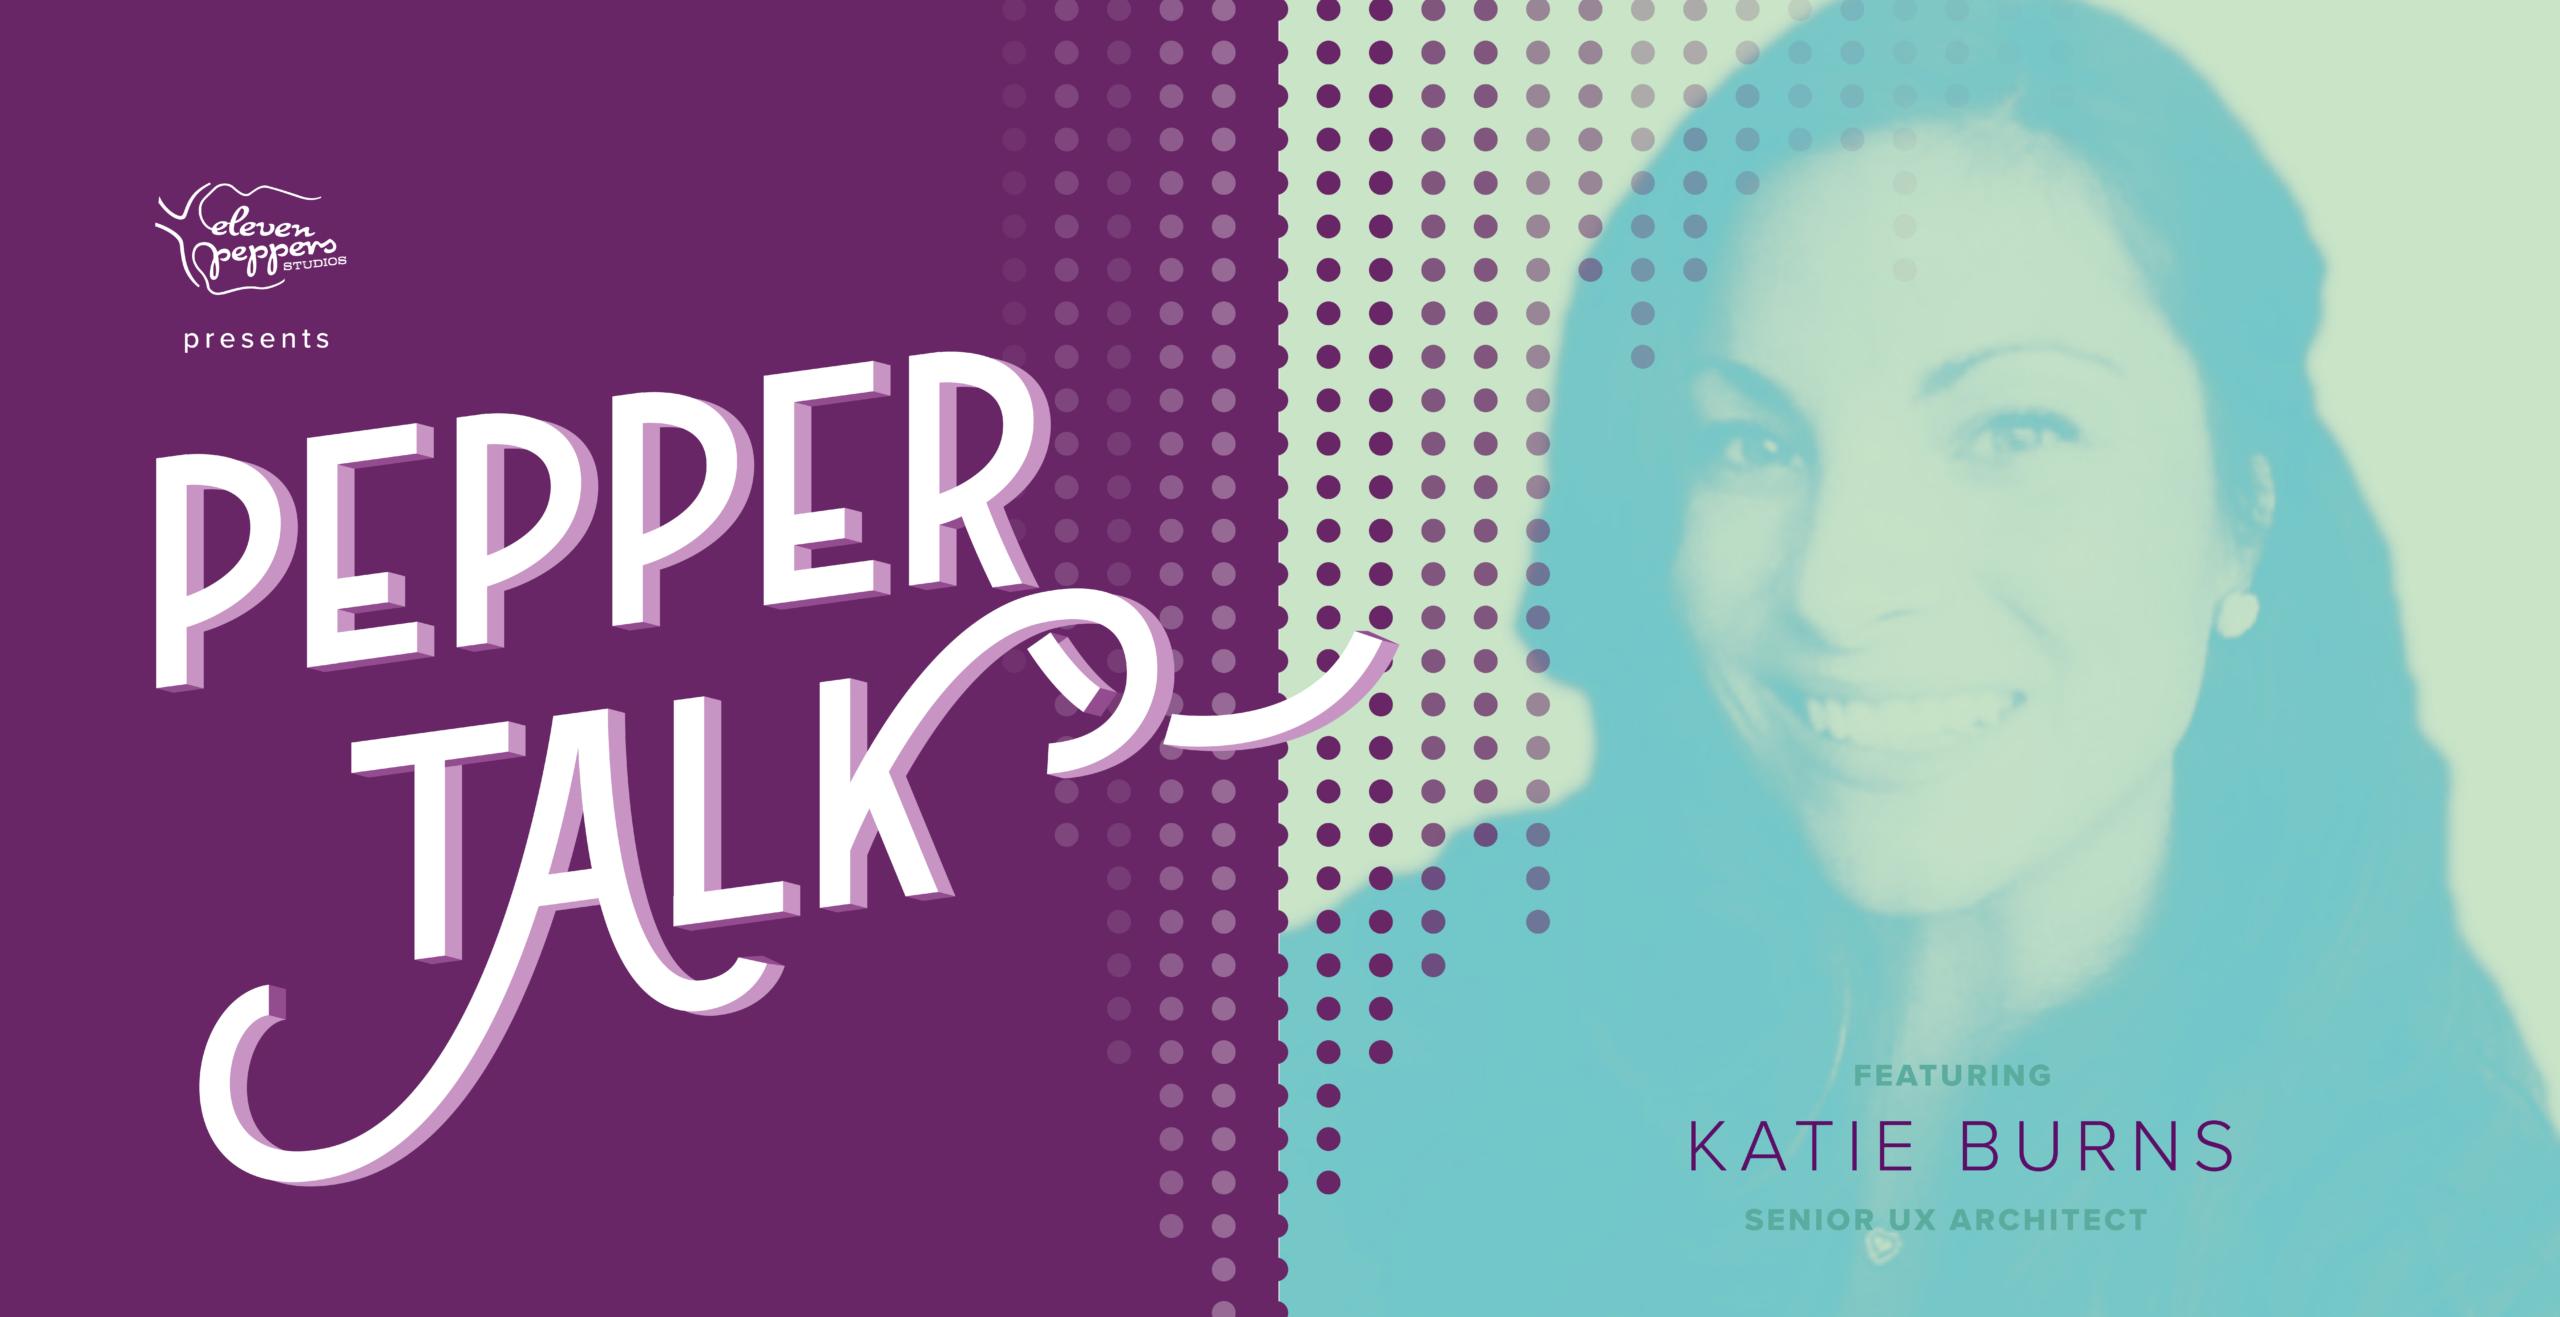 Pepper Talk with Katie Burns